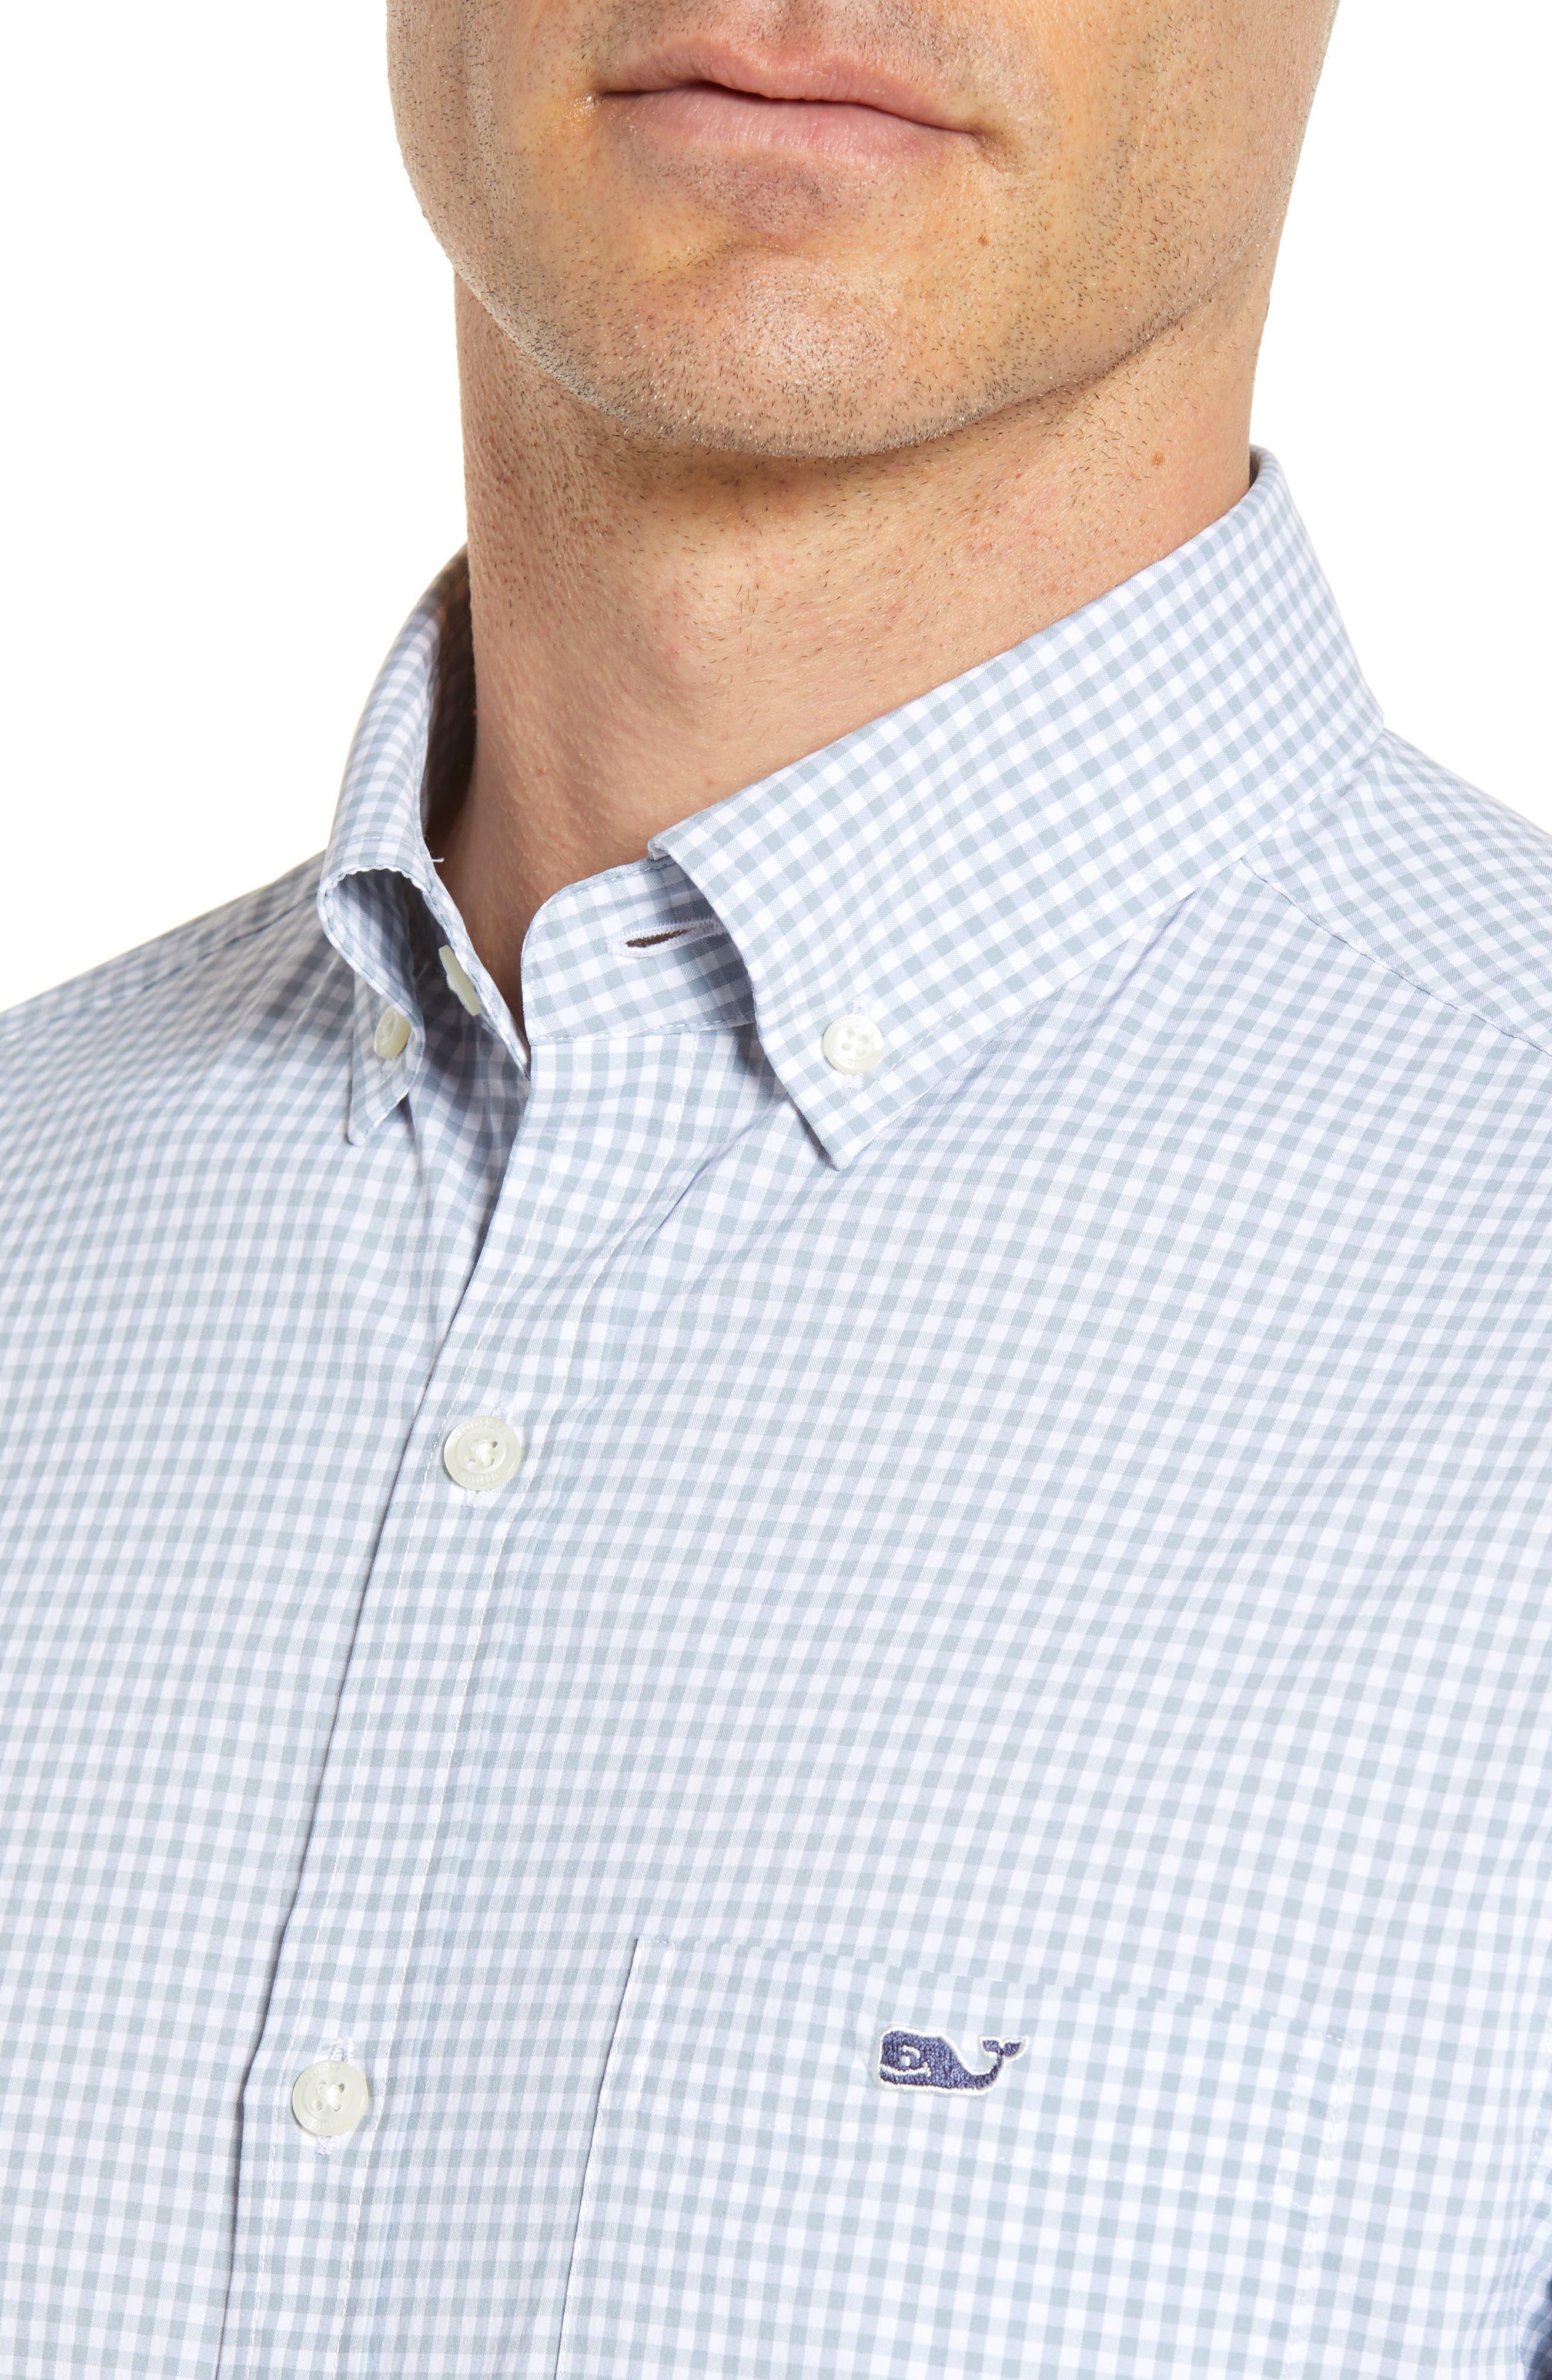 VINEYARD VINES,                             Grand Cay Tucker Regular Fit Gingham Performance Sport Shirt,                             Alternate thumbnail 4, color,                             023